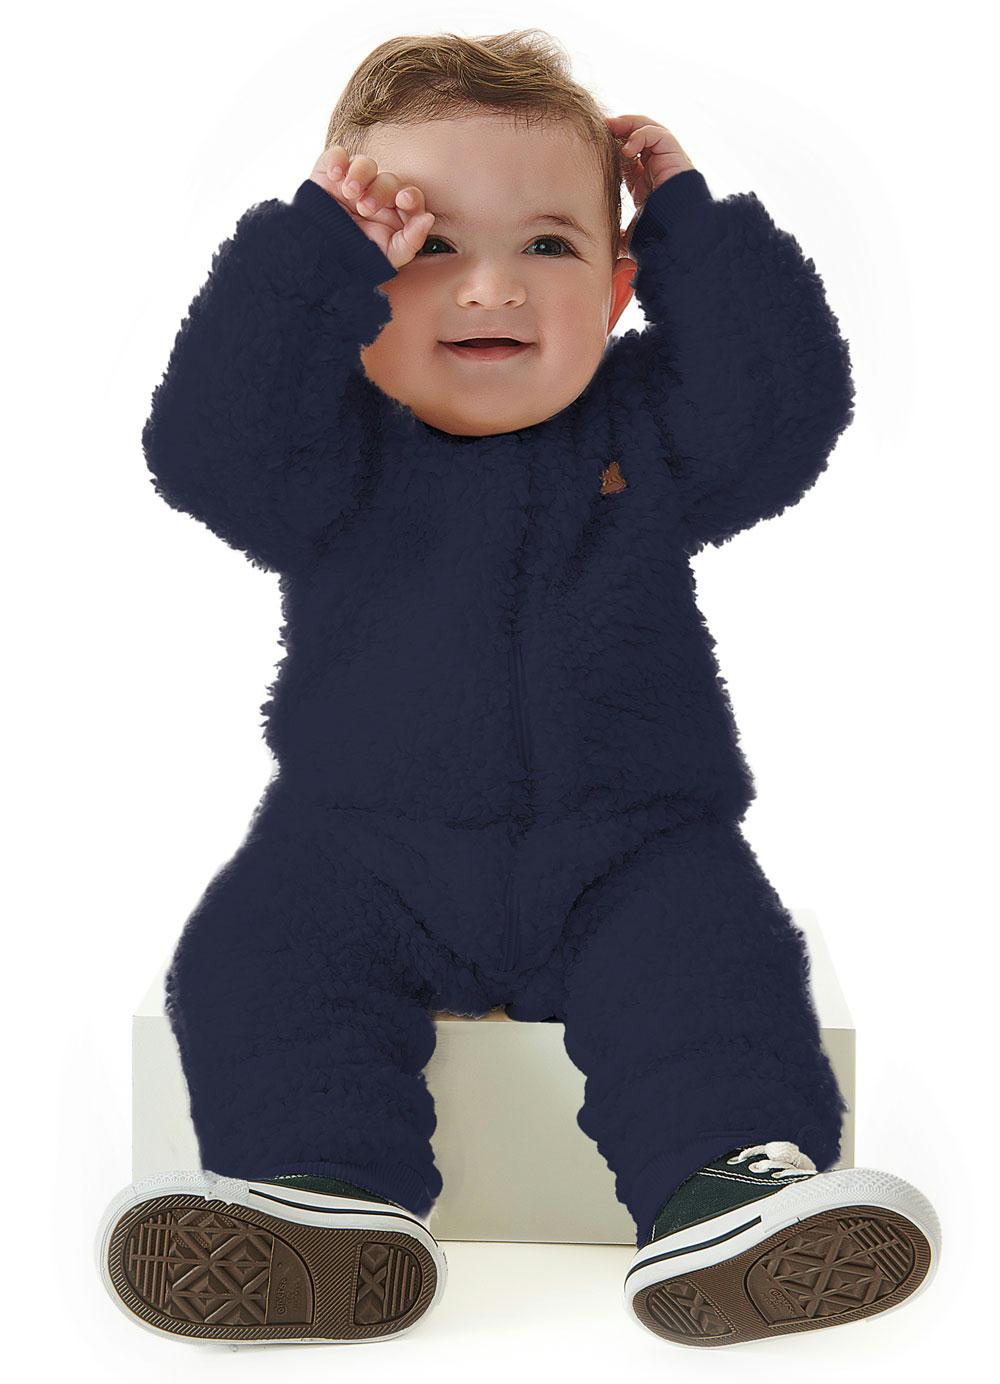 Macacao Manga Longa Pelo E Malha Azul Up Baby